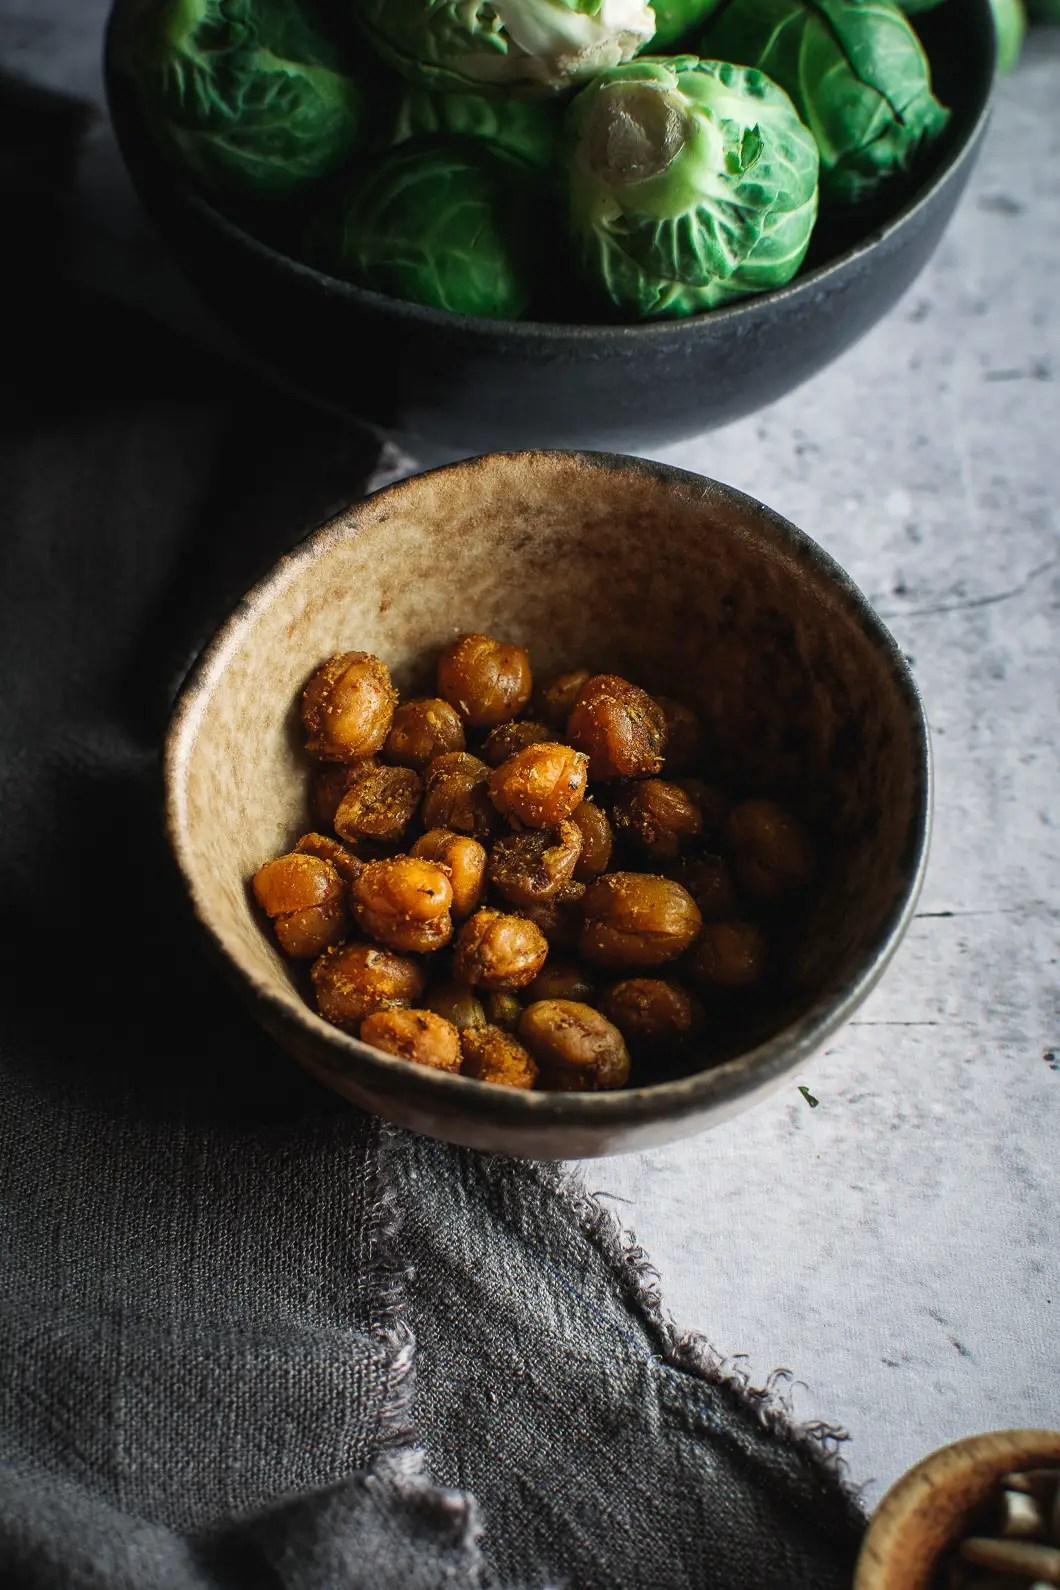 Crispy roasted chickpeas in little bowl